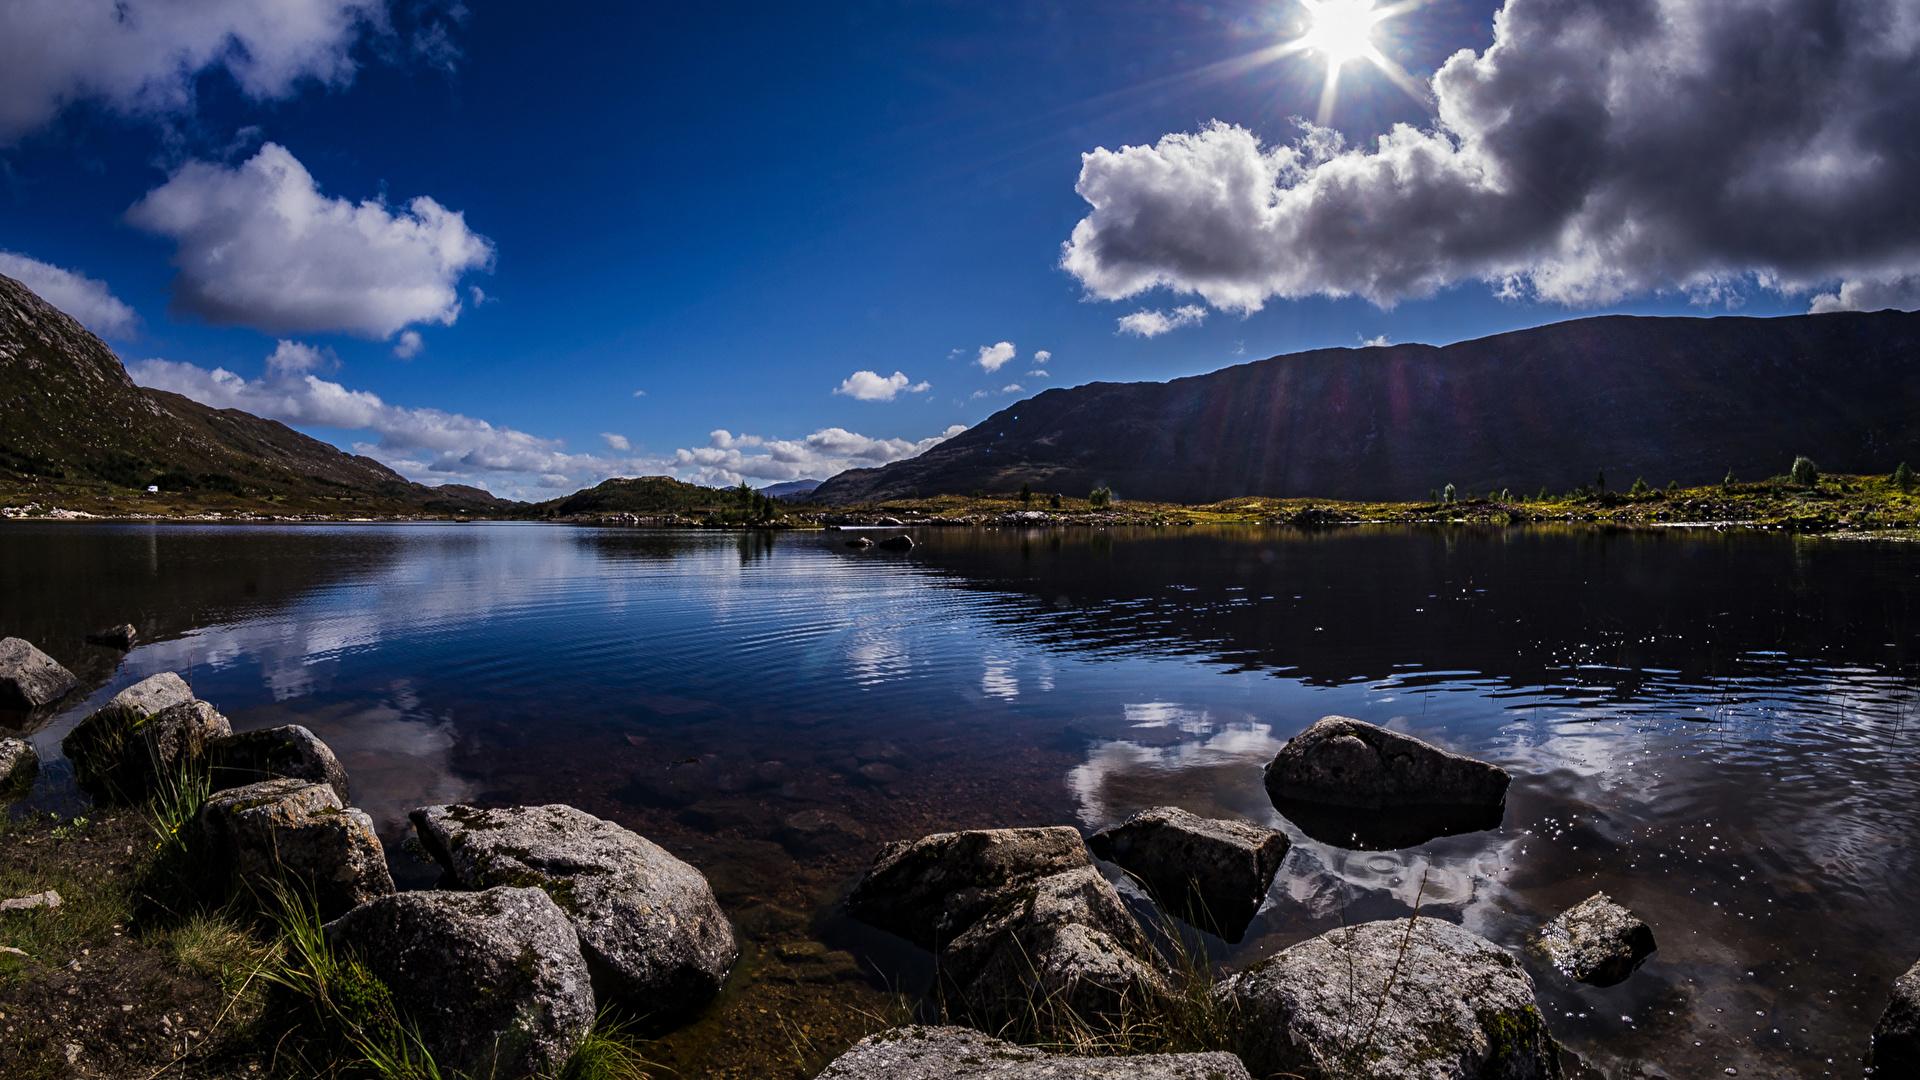 Картинка Шотландия Achallader гора солнца Природа Озеро Камни облачно 1920x1080 Горы Солнце Камень облако Облака